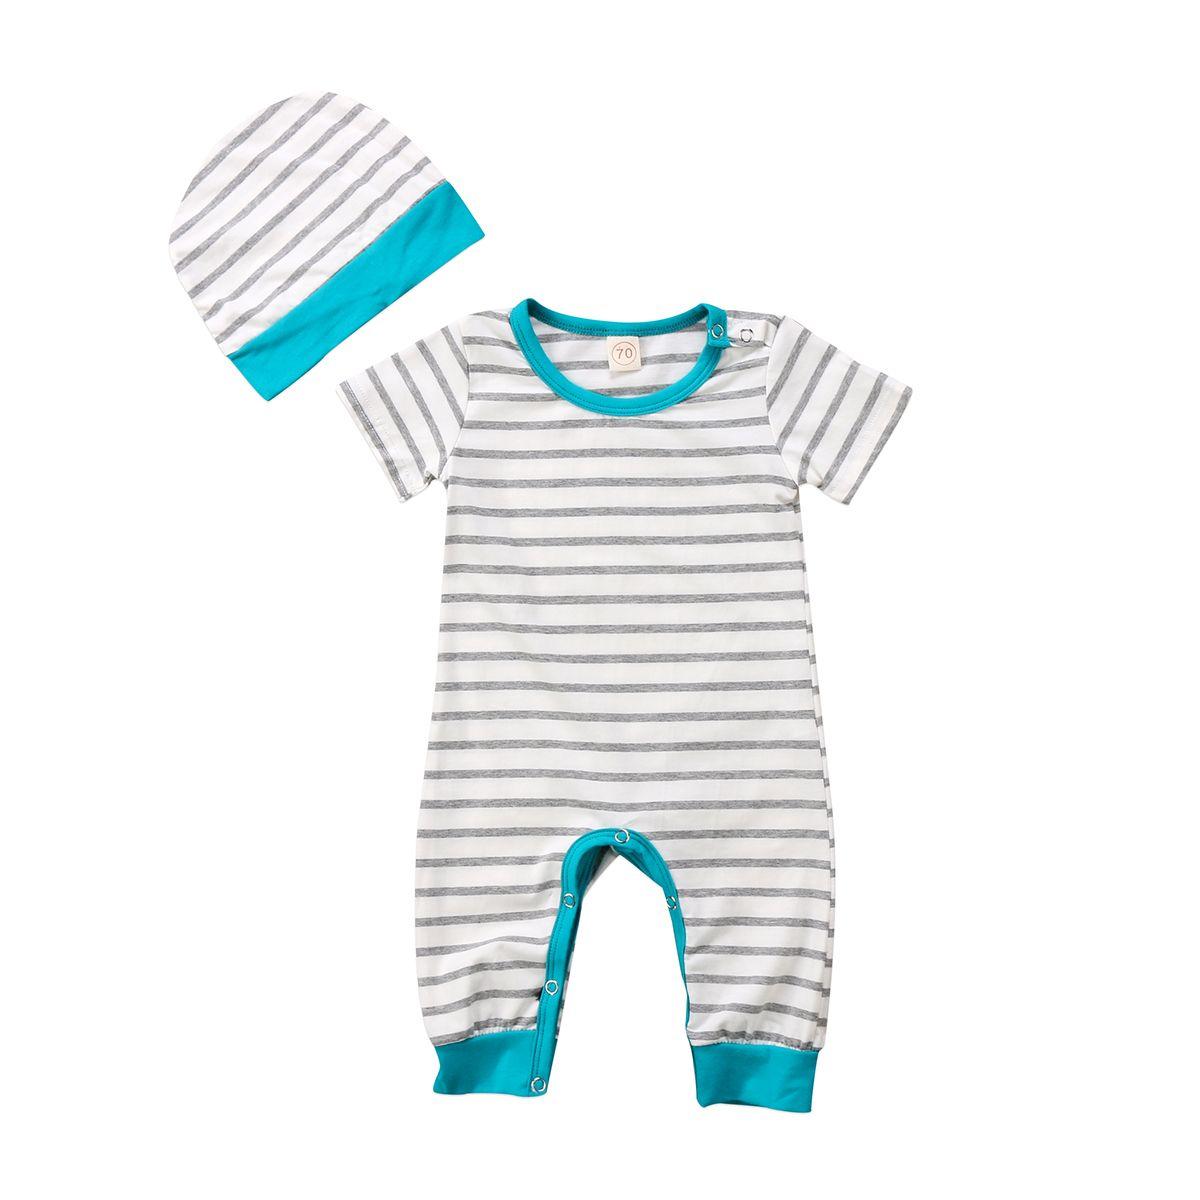 d8c632a6f Newborn Baby Boys Girls Romper Short Sleeve Striped Jumpsuit (0-18 ...